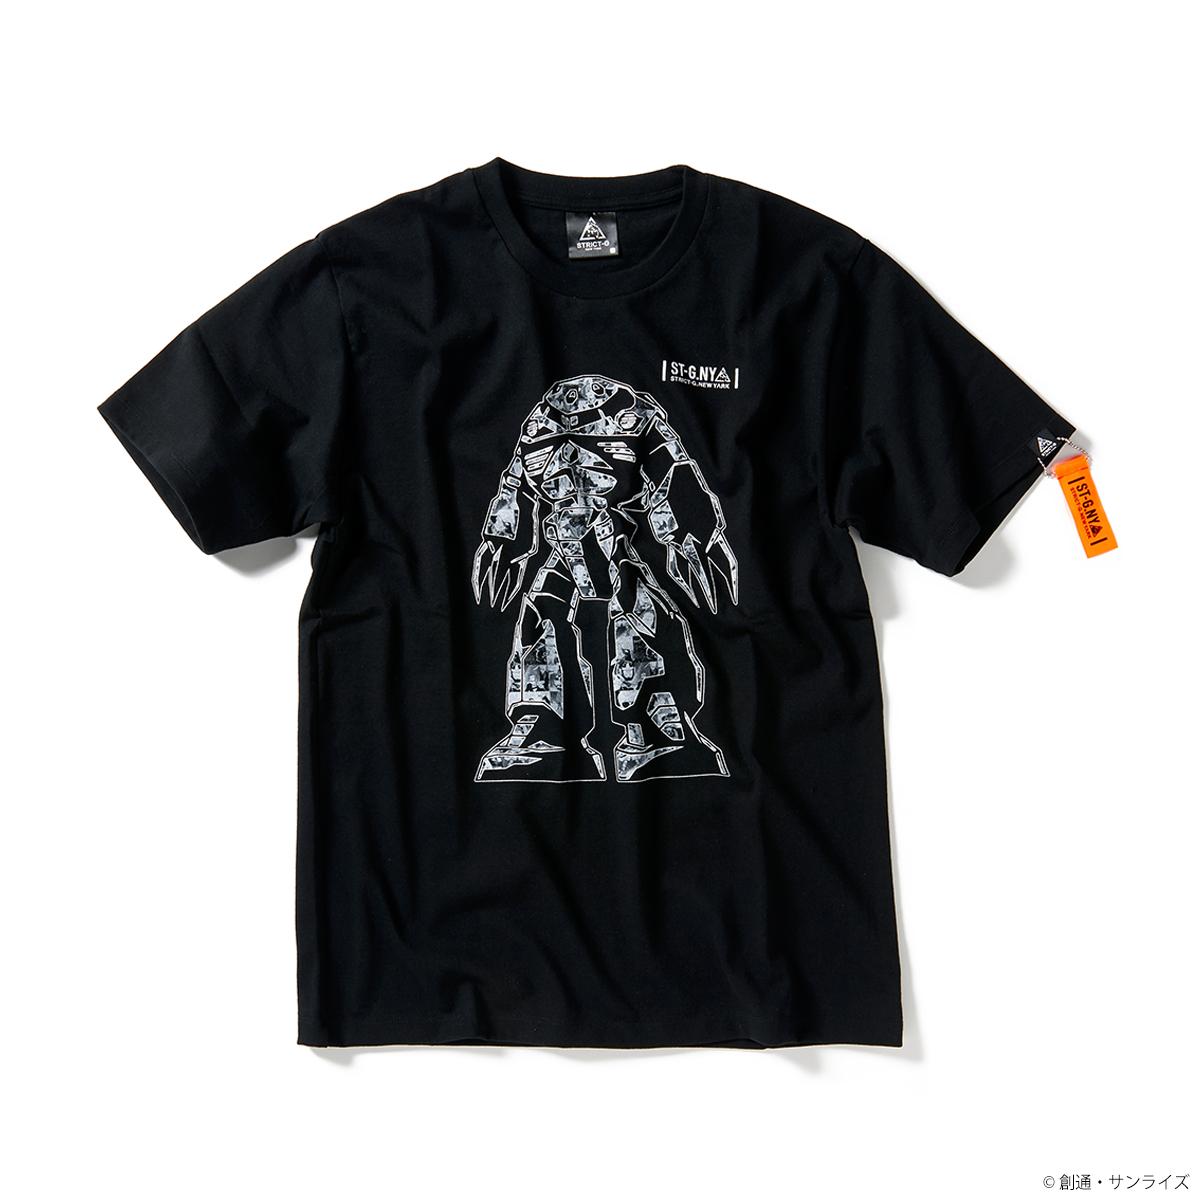 """STRICT-G NEW YARK"" 1 YEAR WAR第四弾発売!"